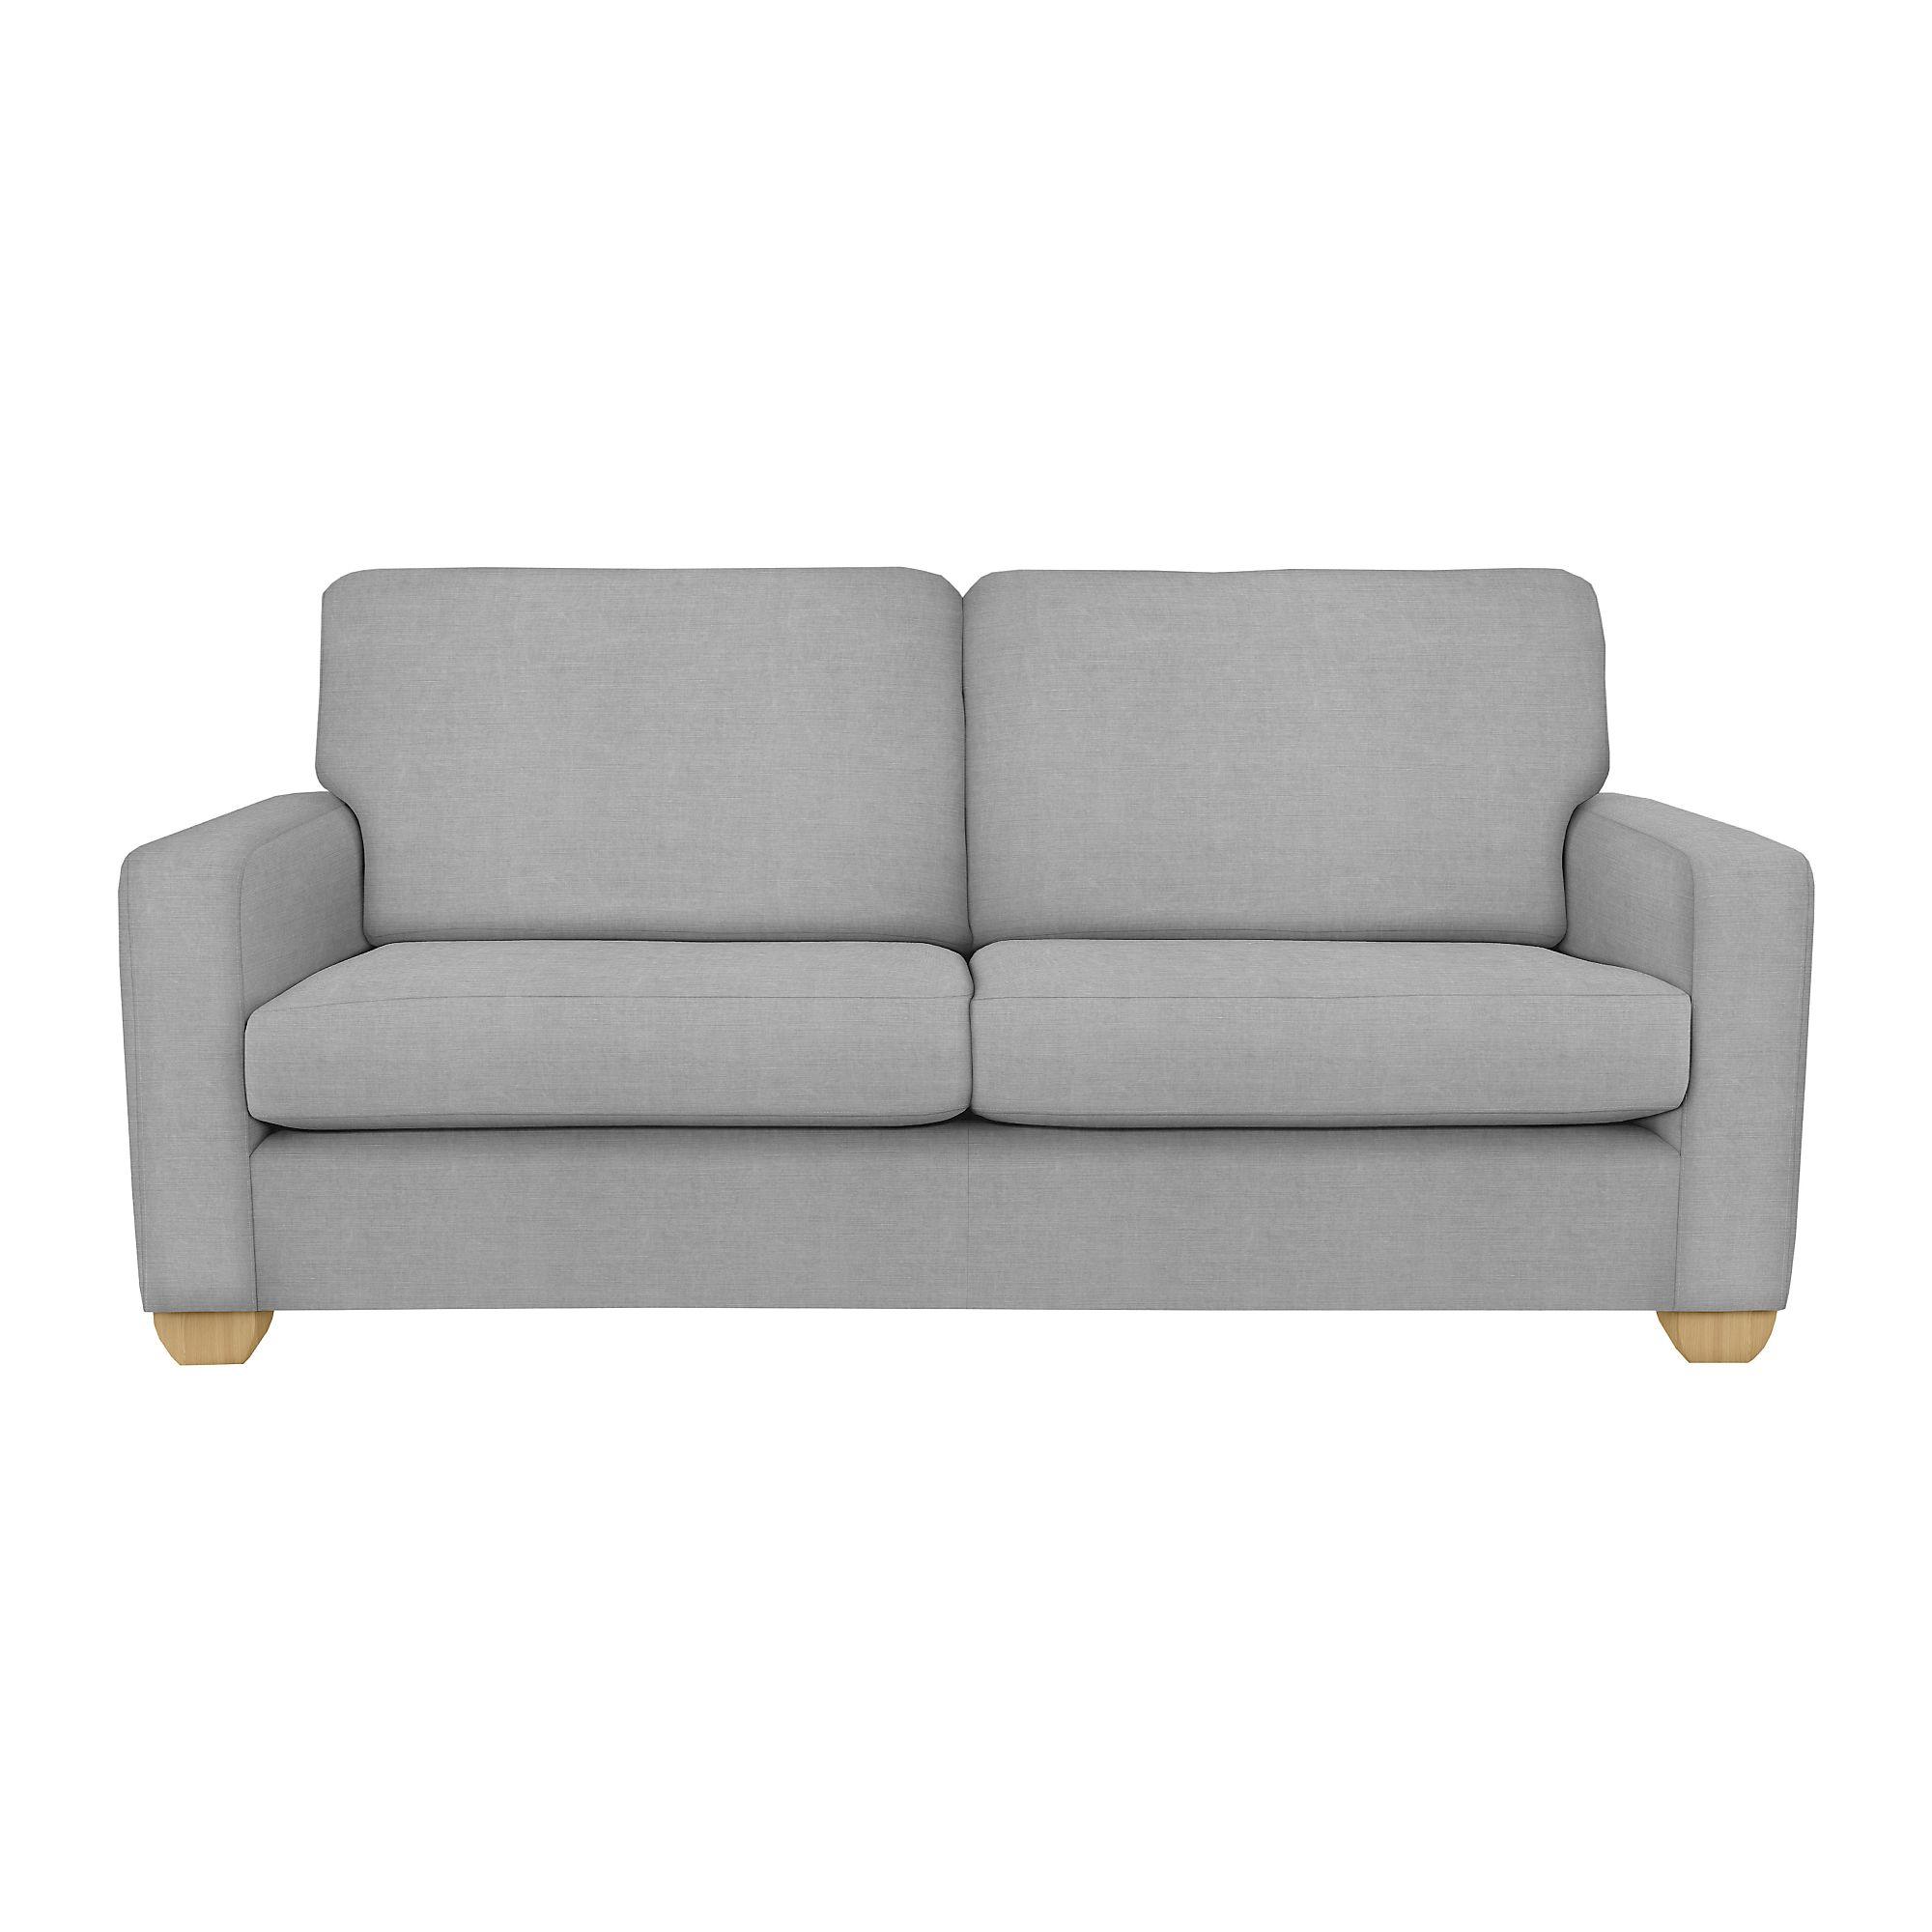 john lewis gino medium sofa. Black Bedroom Furniture Sets. Home Design Ideas